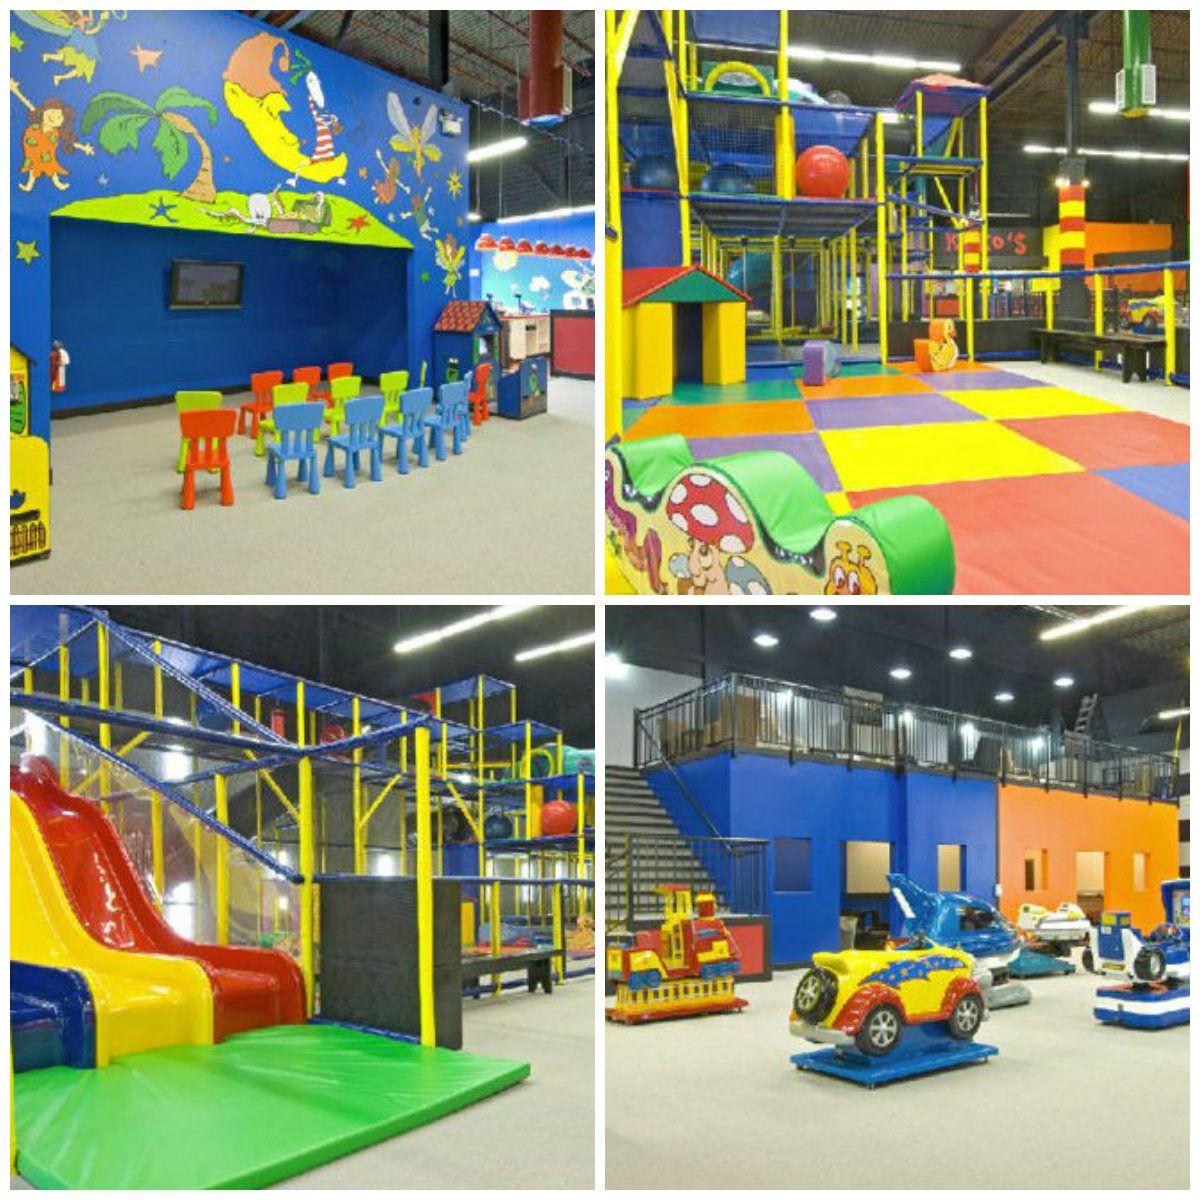 Best indoor playgrounds in canada indoor playground for Indoor play area for kids